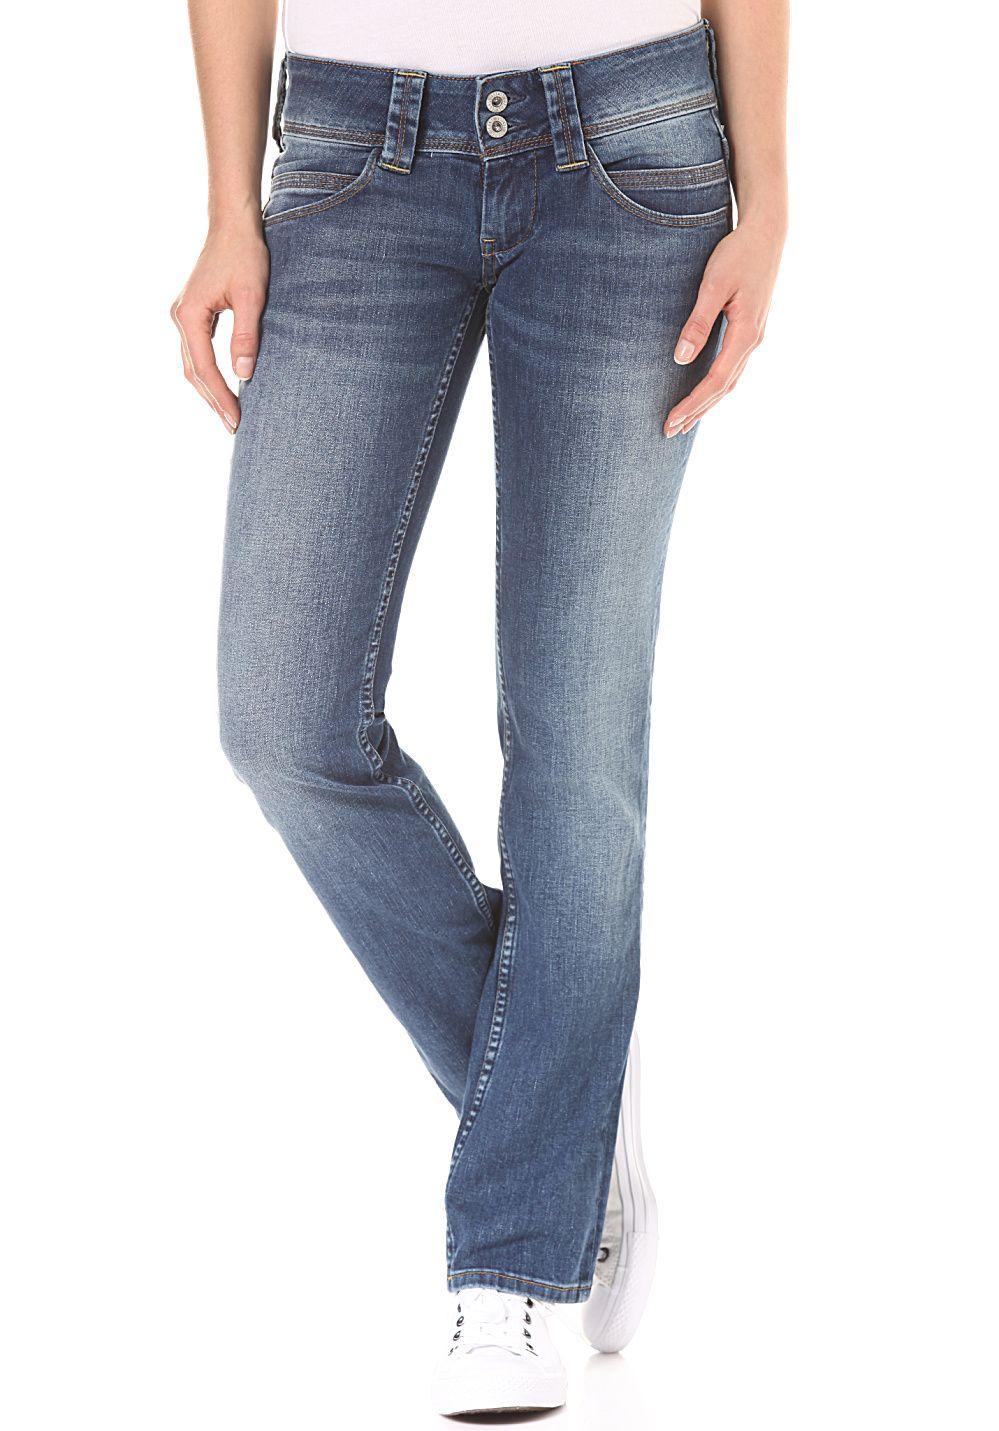 f1721b8e85f Pepe Jeans Venus - Jean pour Femme - Bleu